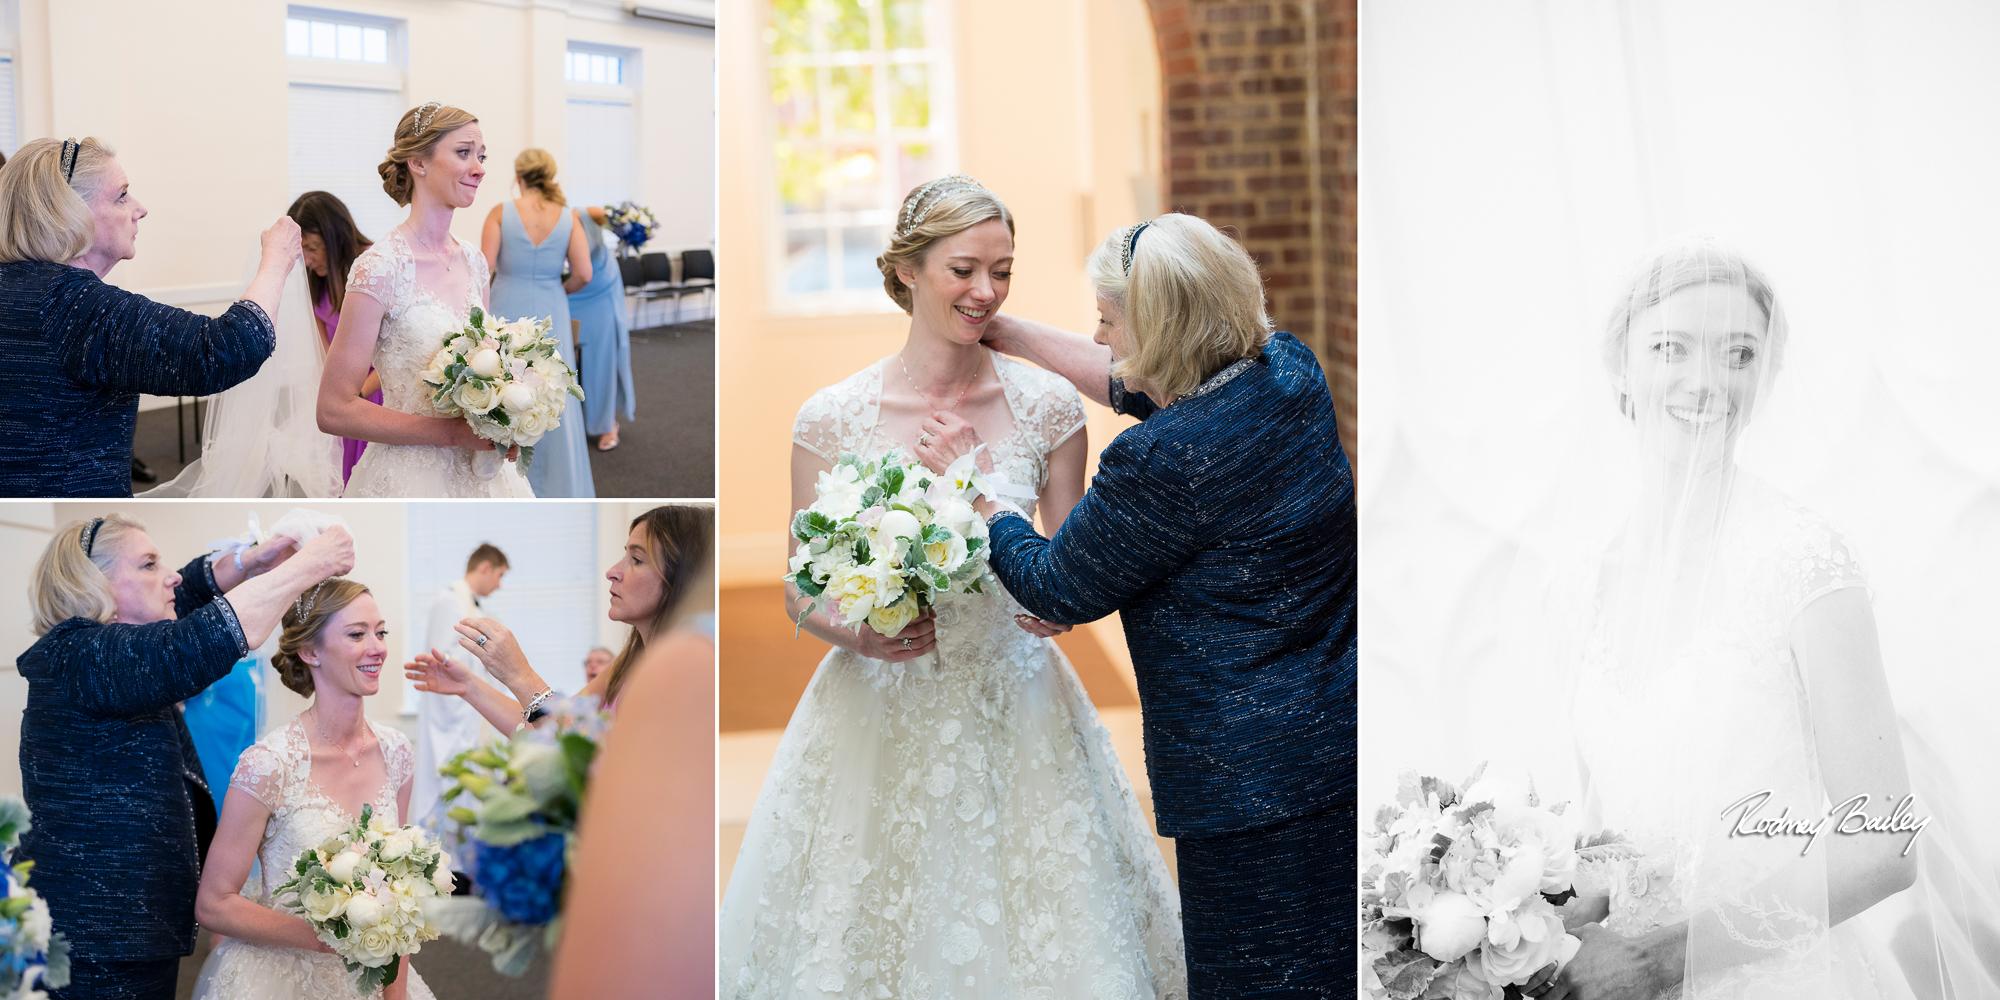 Wedding Photographers Alexandria Virginia Wedding Photography by Rodney Bailey